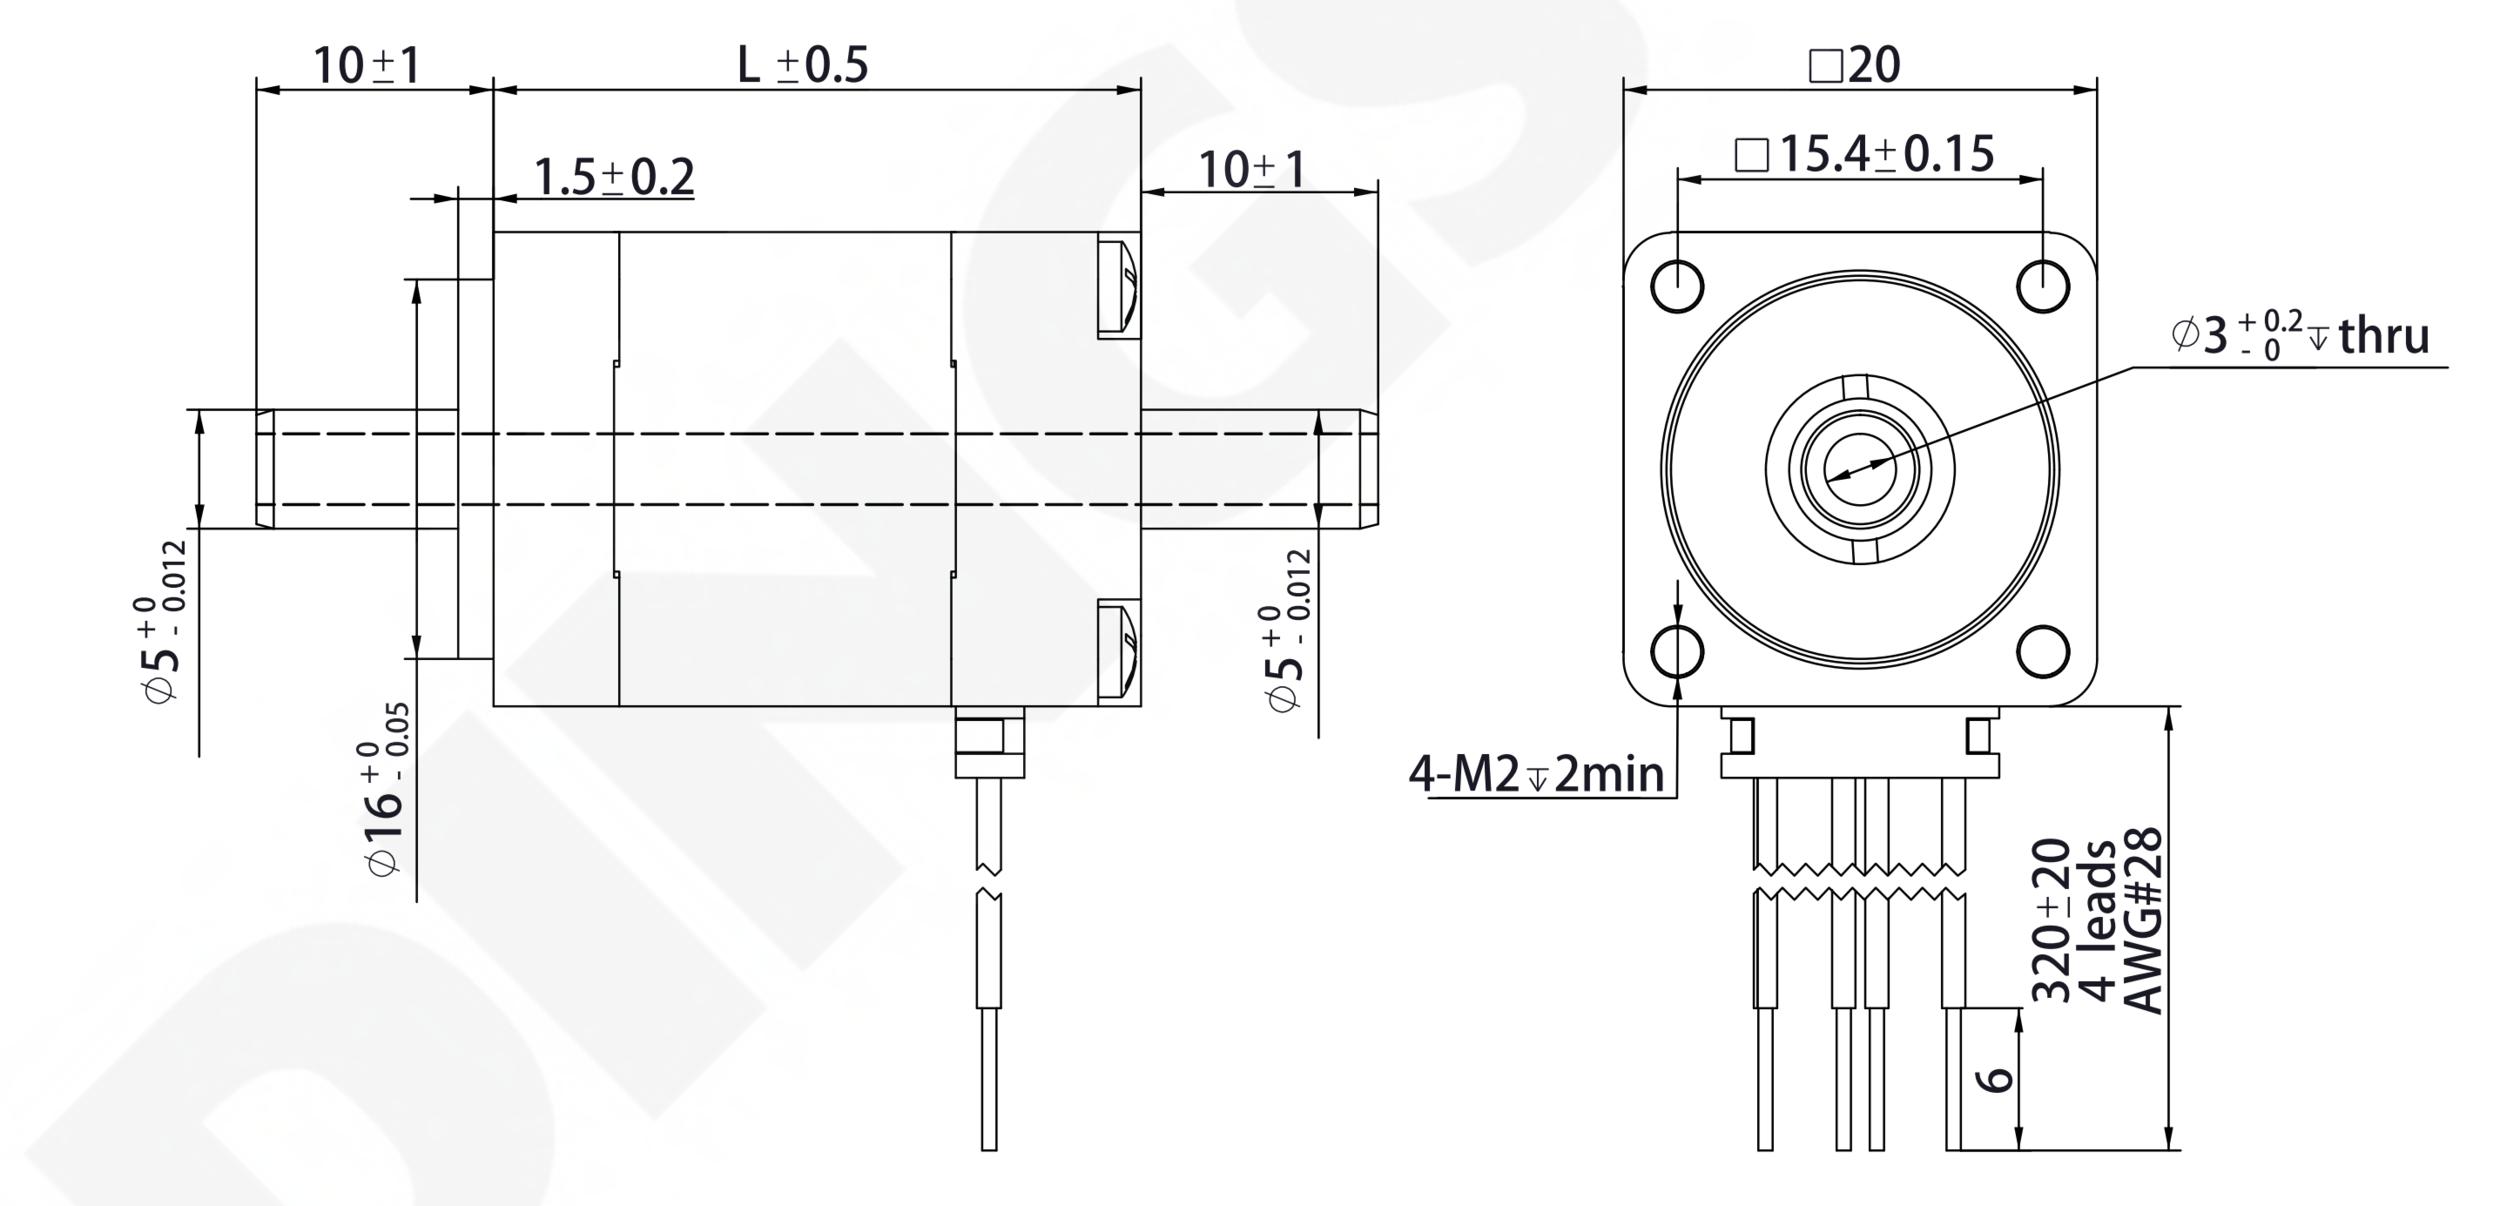 NEMA 8 Hollow Shaft Motor Drawing